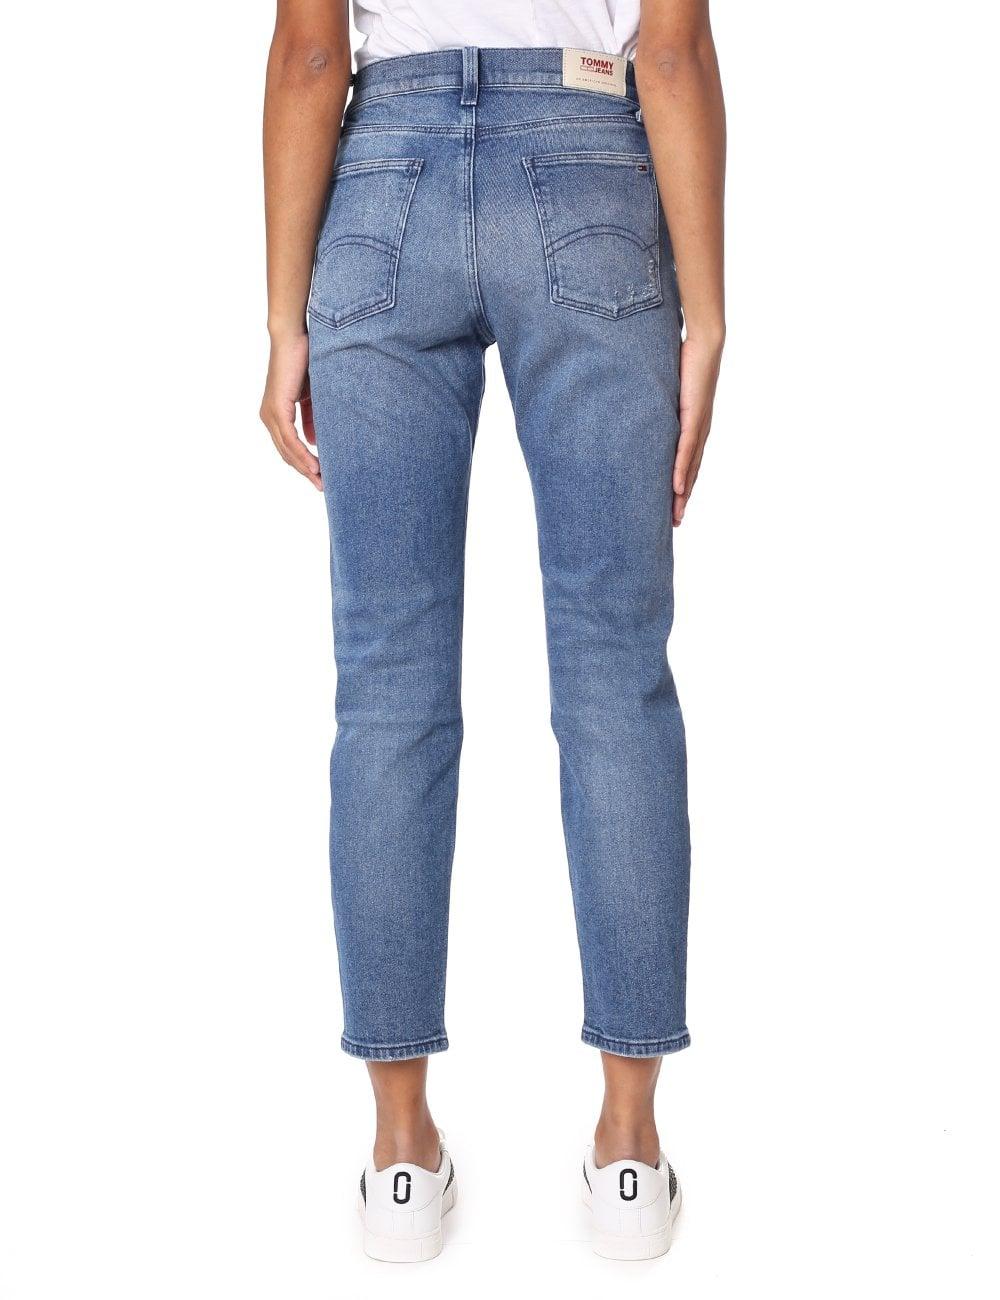 8a64e62e Tommy Hilfiger Women's High Rise Slim Izzy Jean